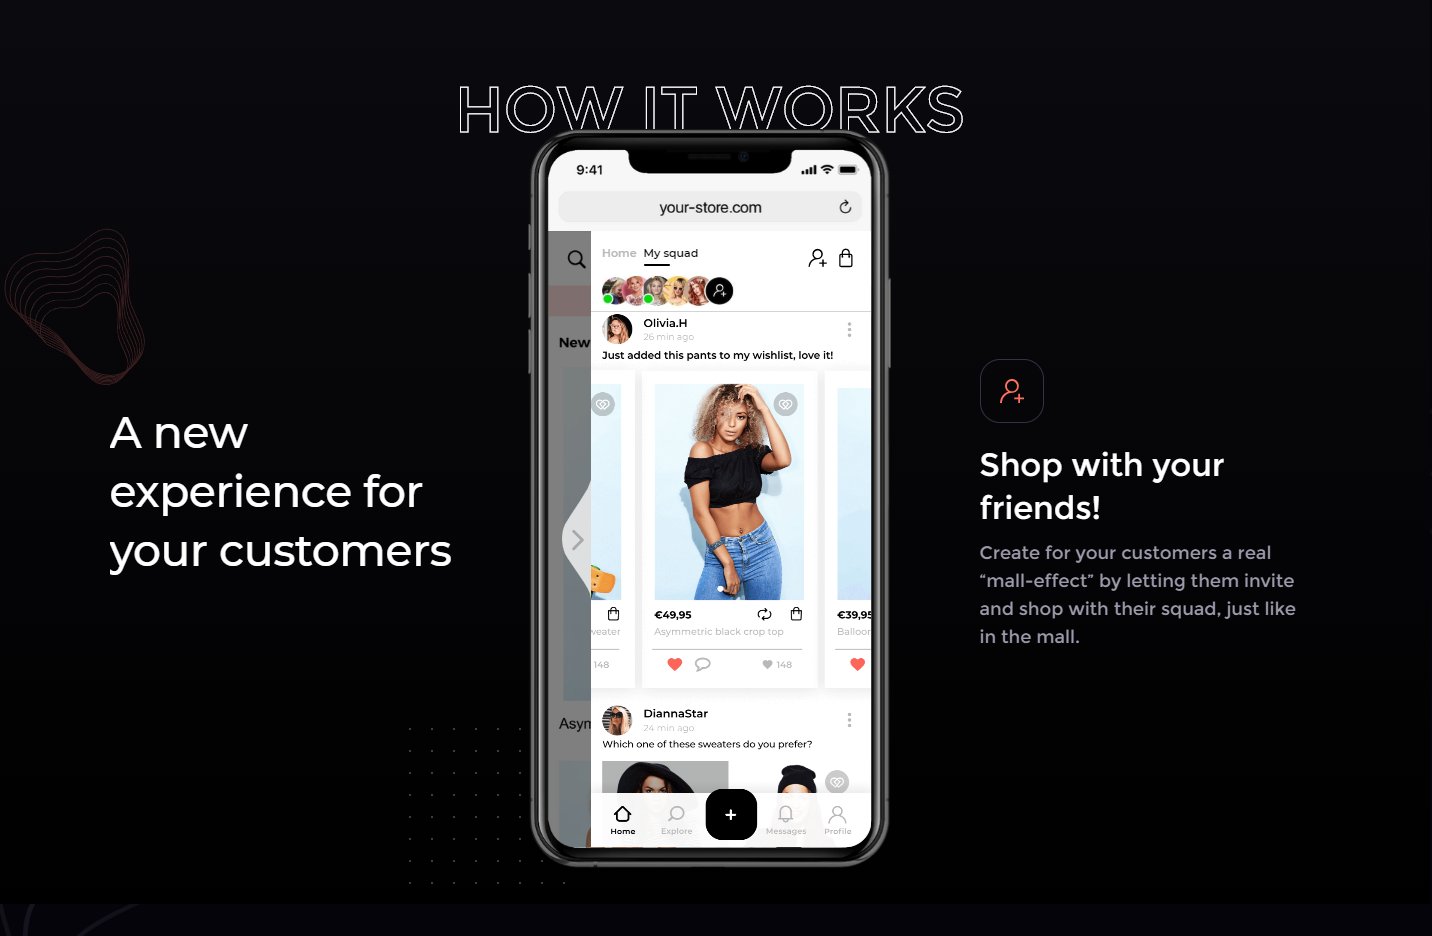 «Lass uns zusammen shoppen gehen – also online»